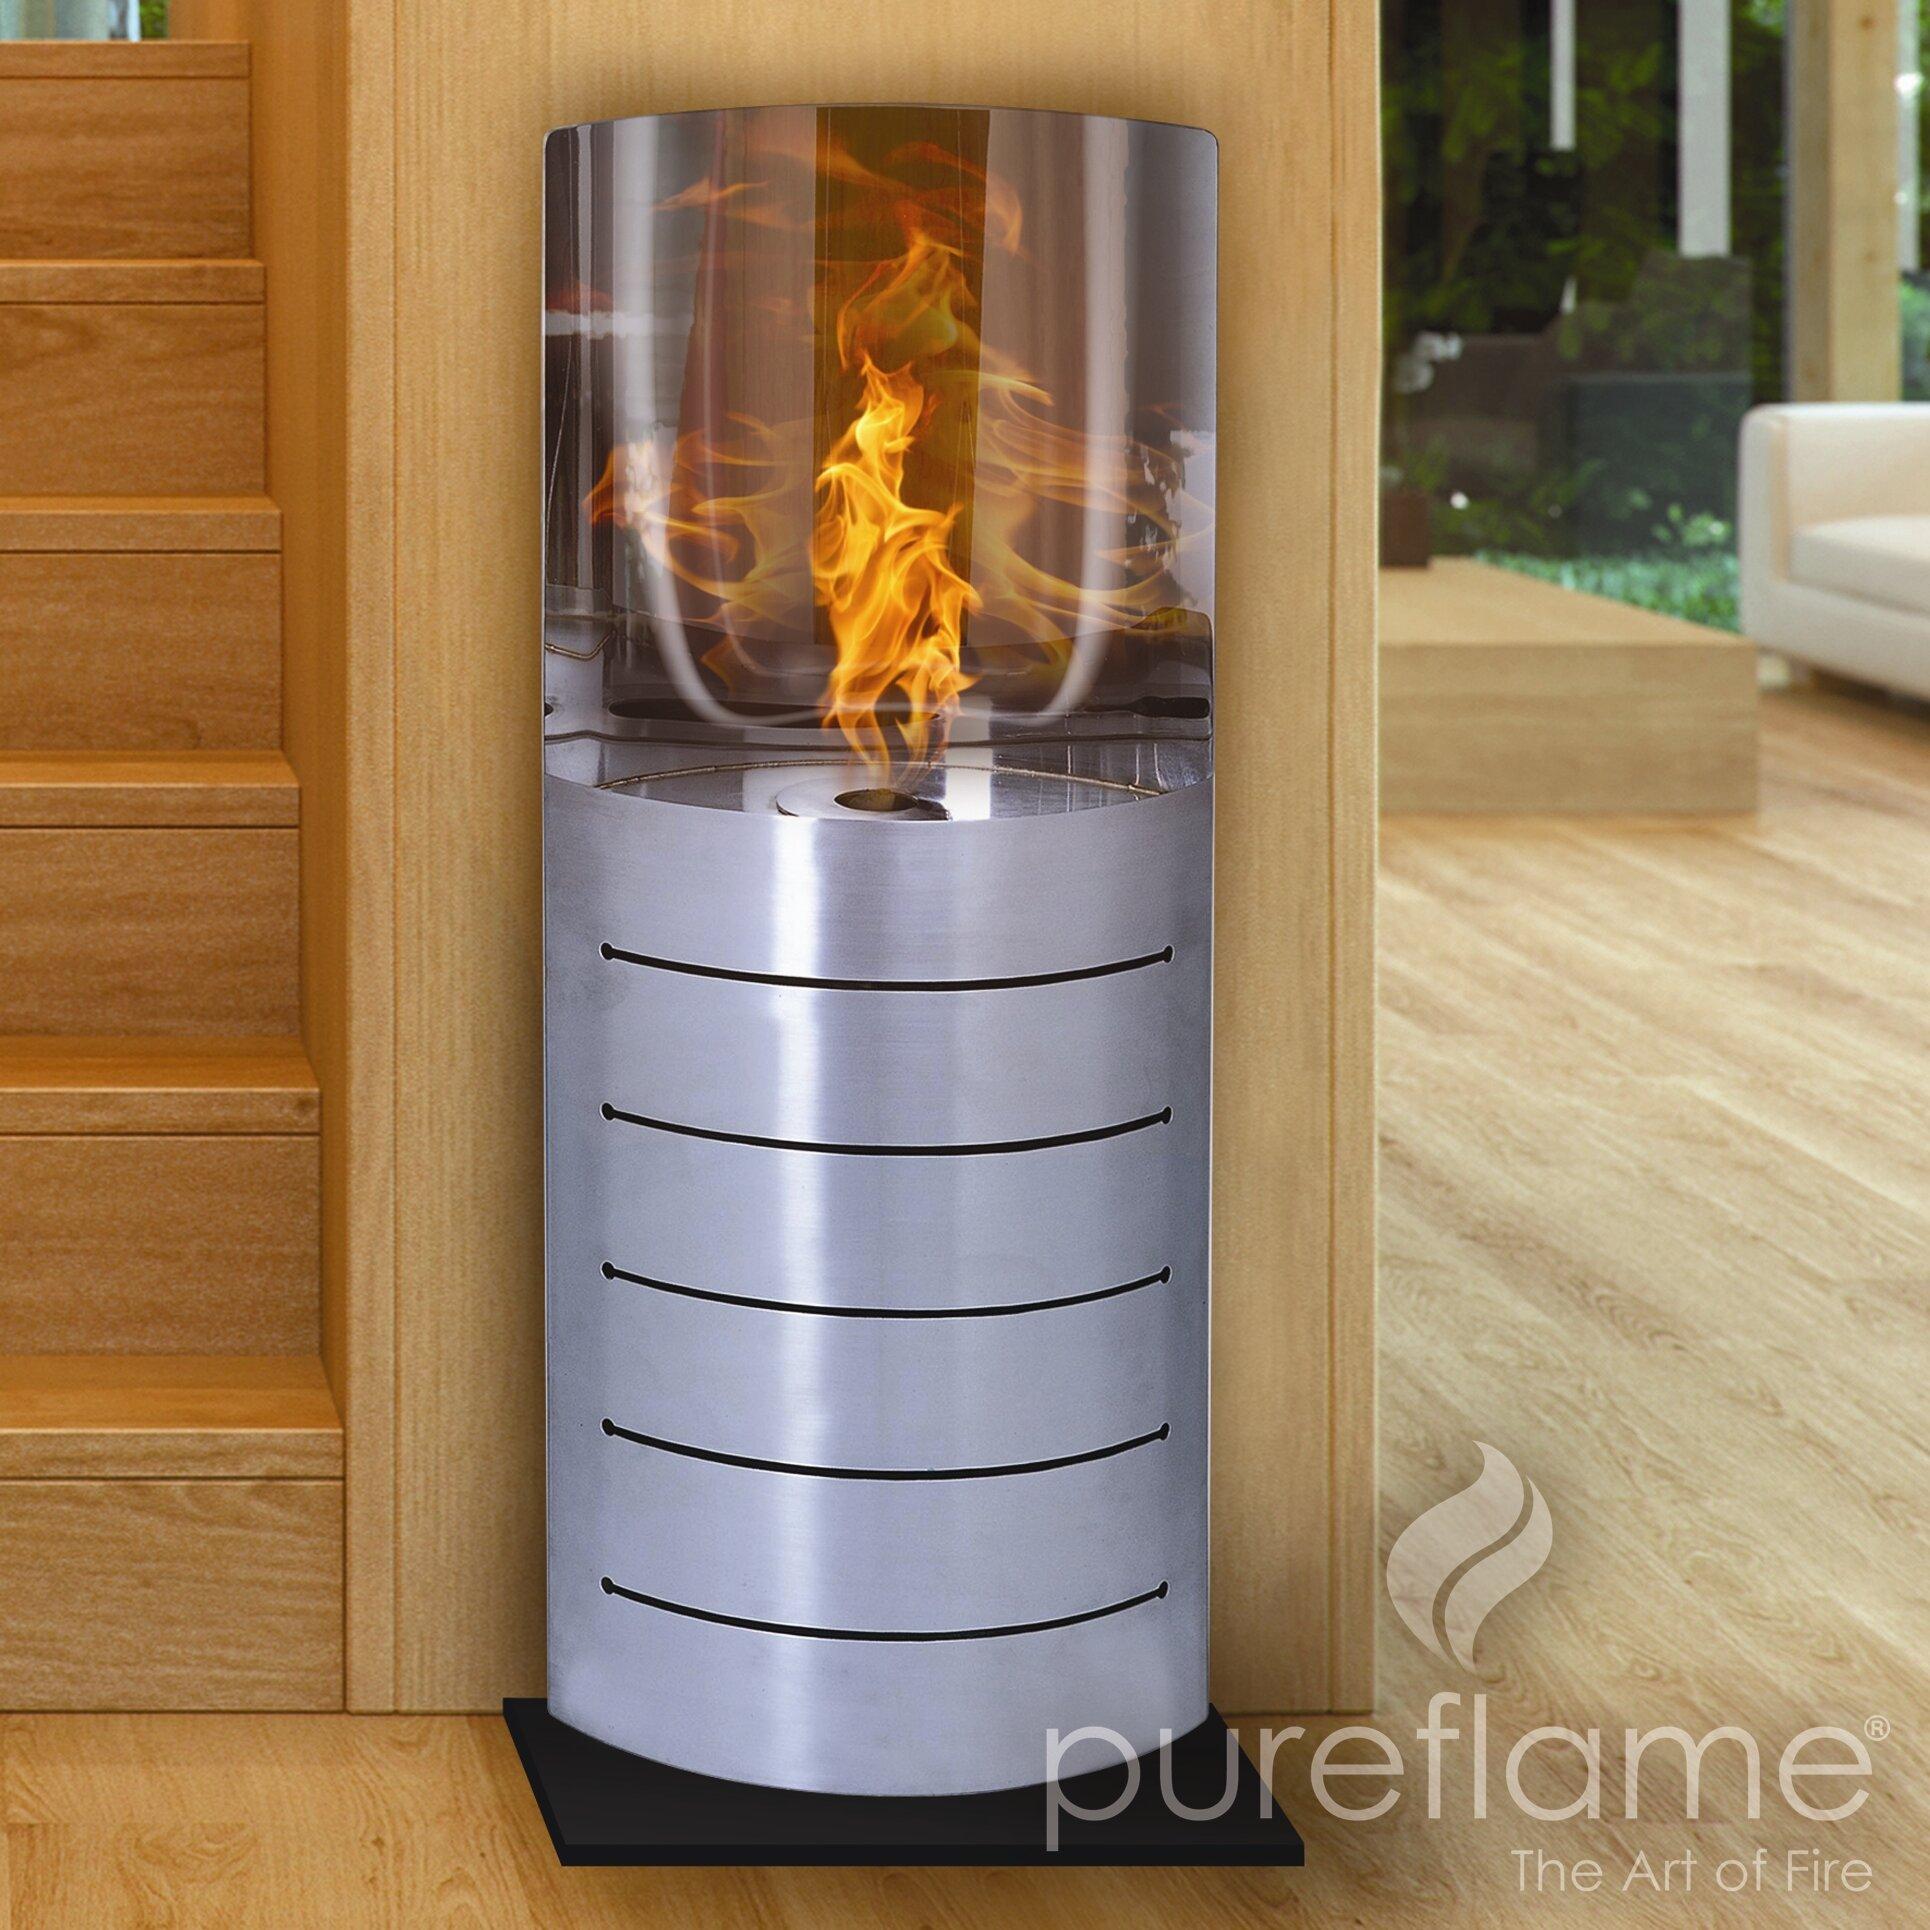 Aquafires titan ethanol fireplace wayfair for Ethanol outdoor fire pit